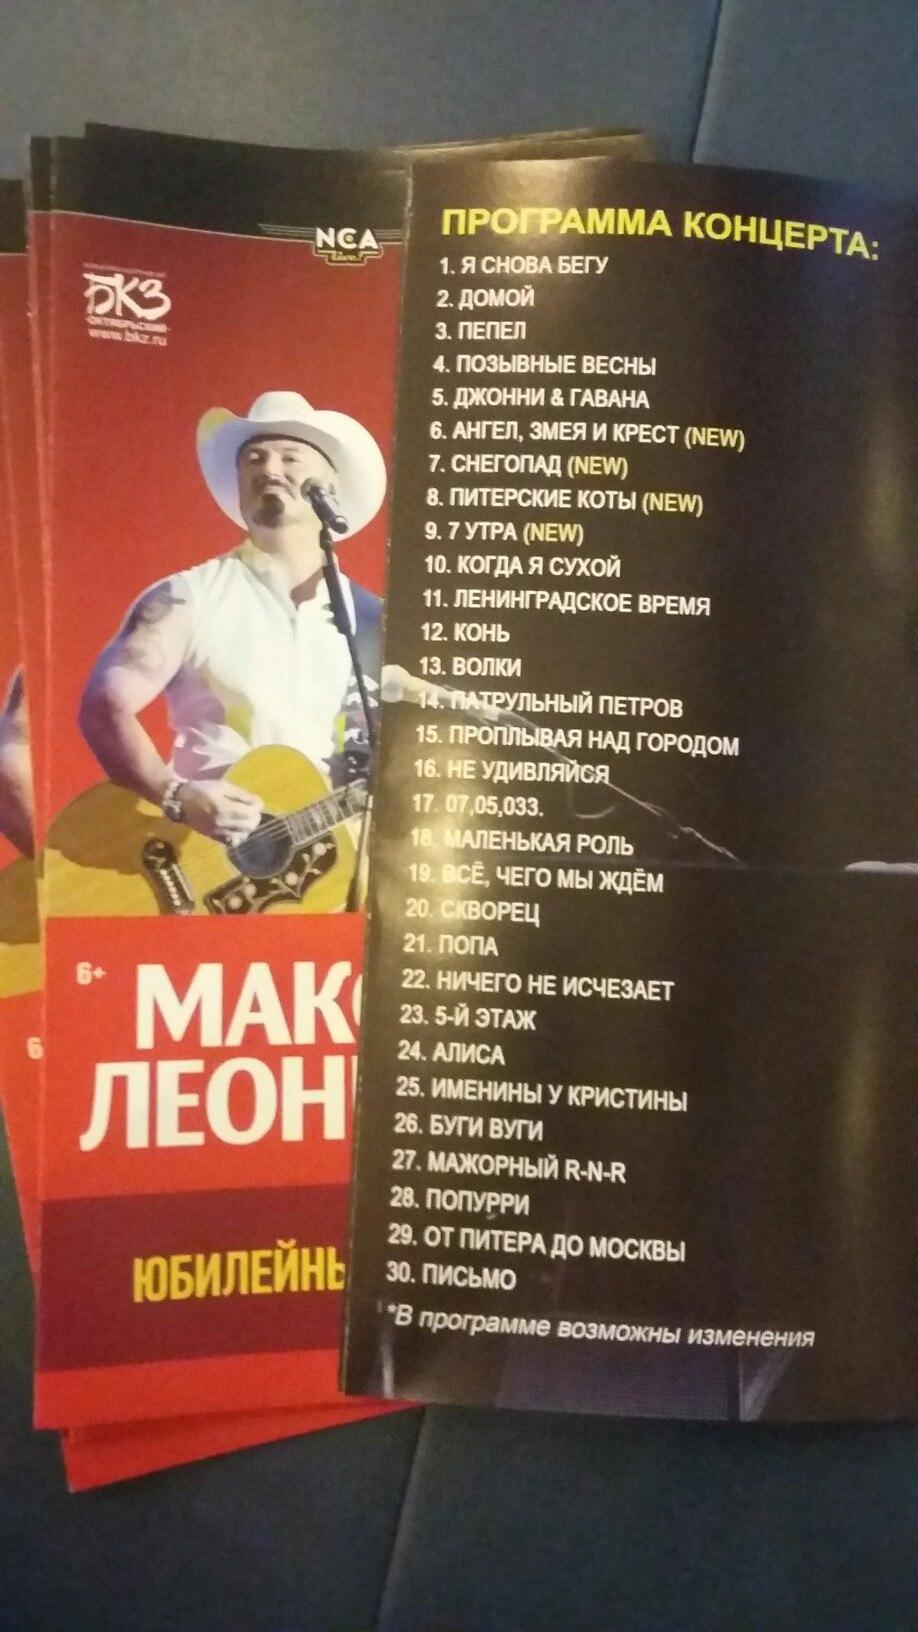 Фото напечатанной программки концерта Максима Леонидова 2